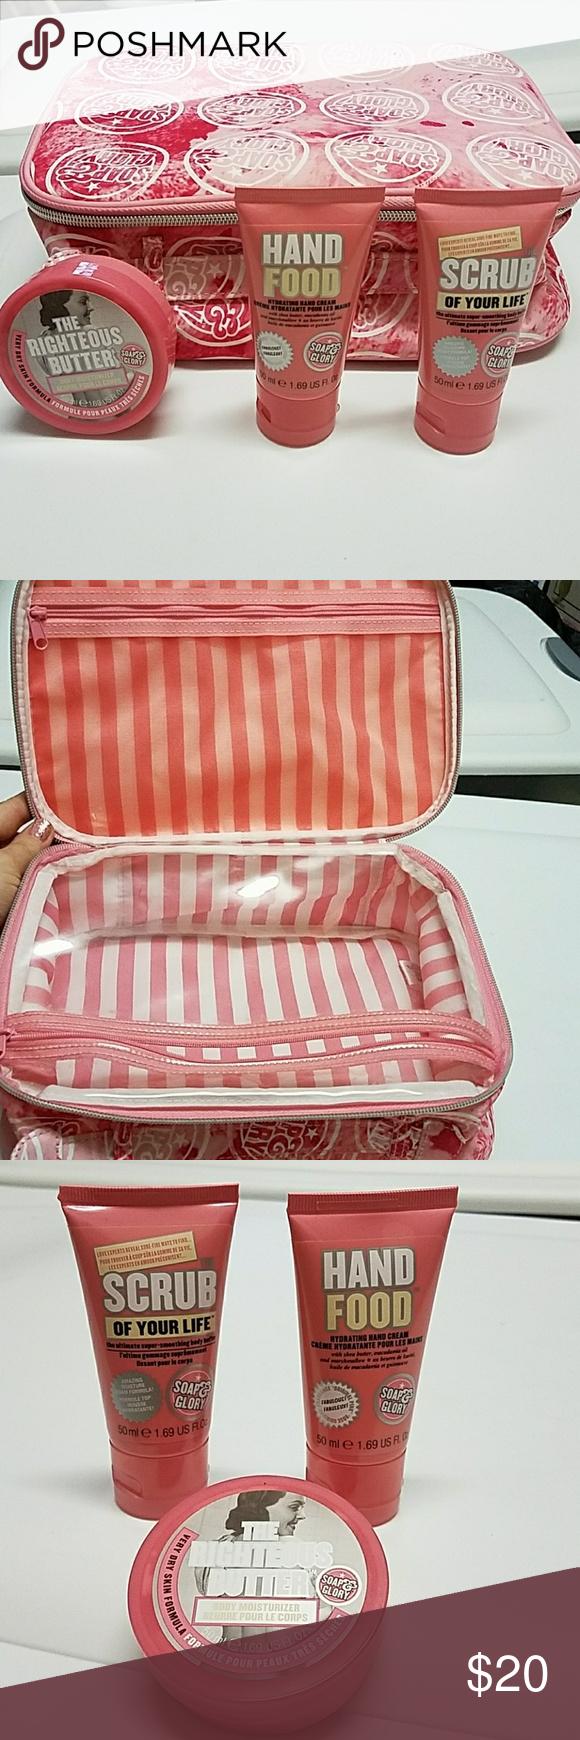 Soap & Glory bag, travel size products Moisturizer